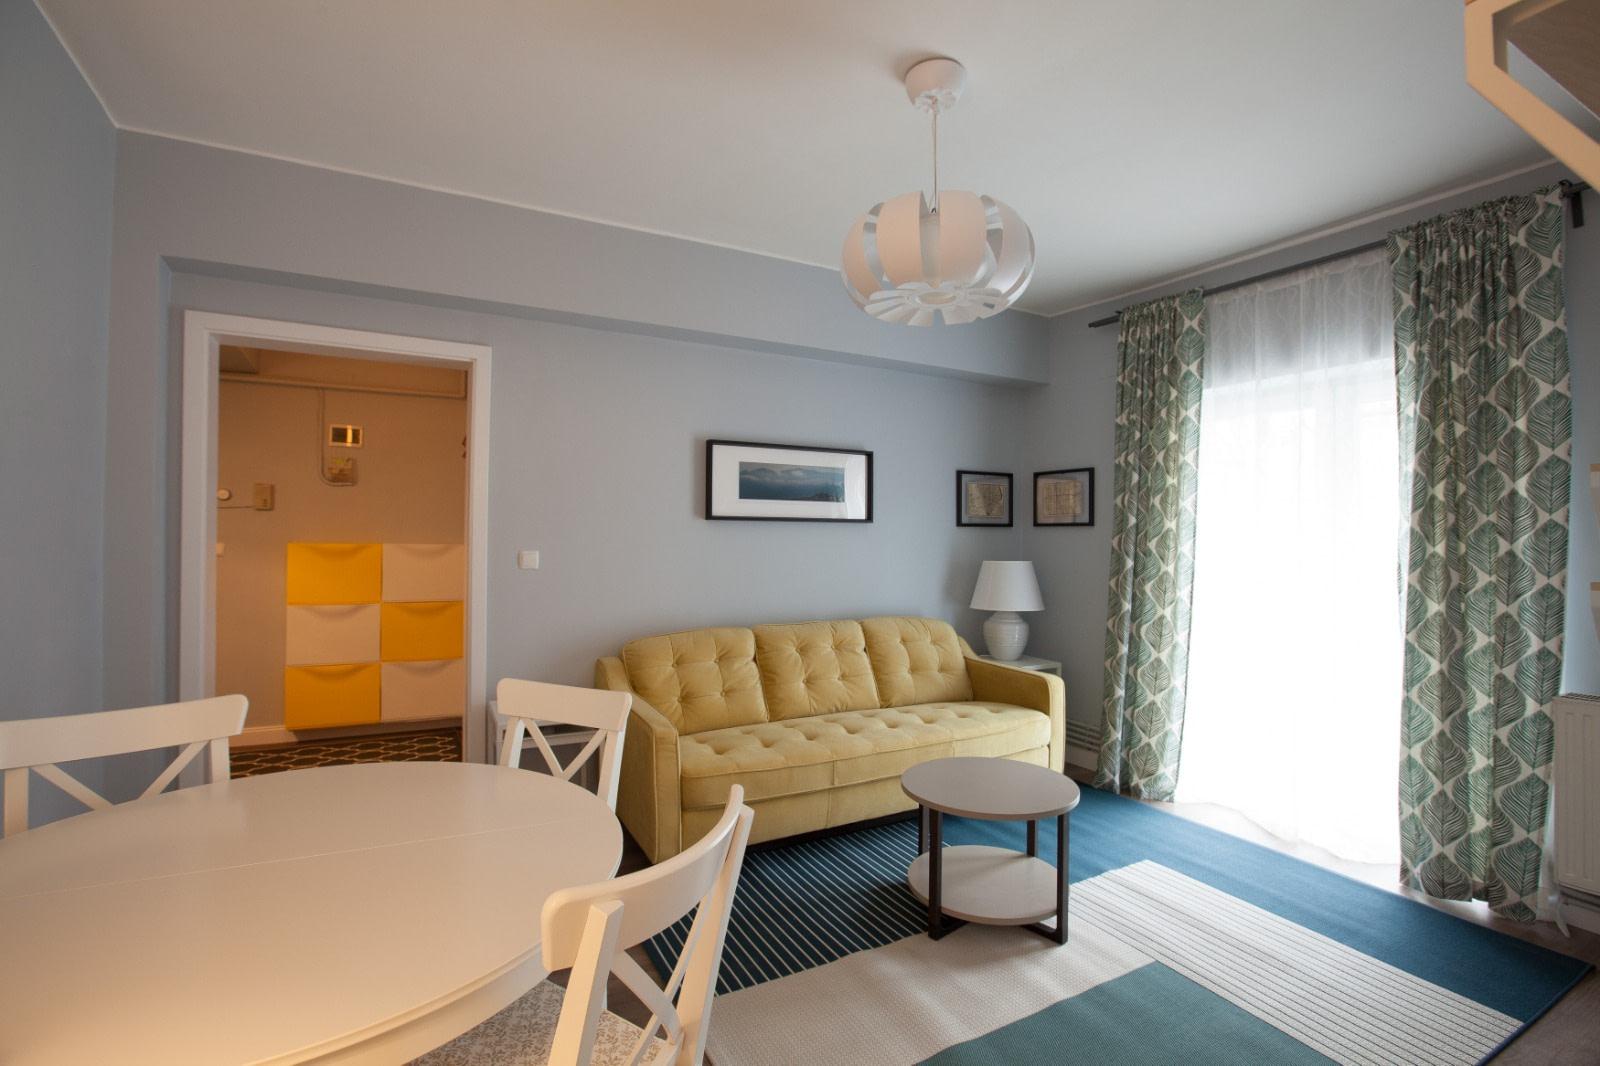 2 Camere | Brezoianu | Parc Cismigiu | Renovat | Centrala